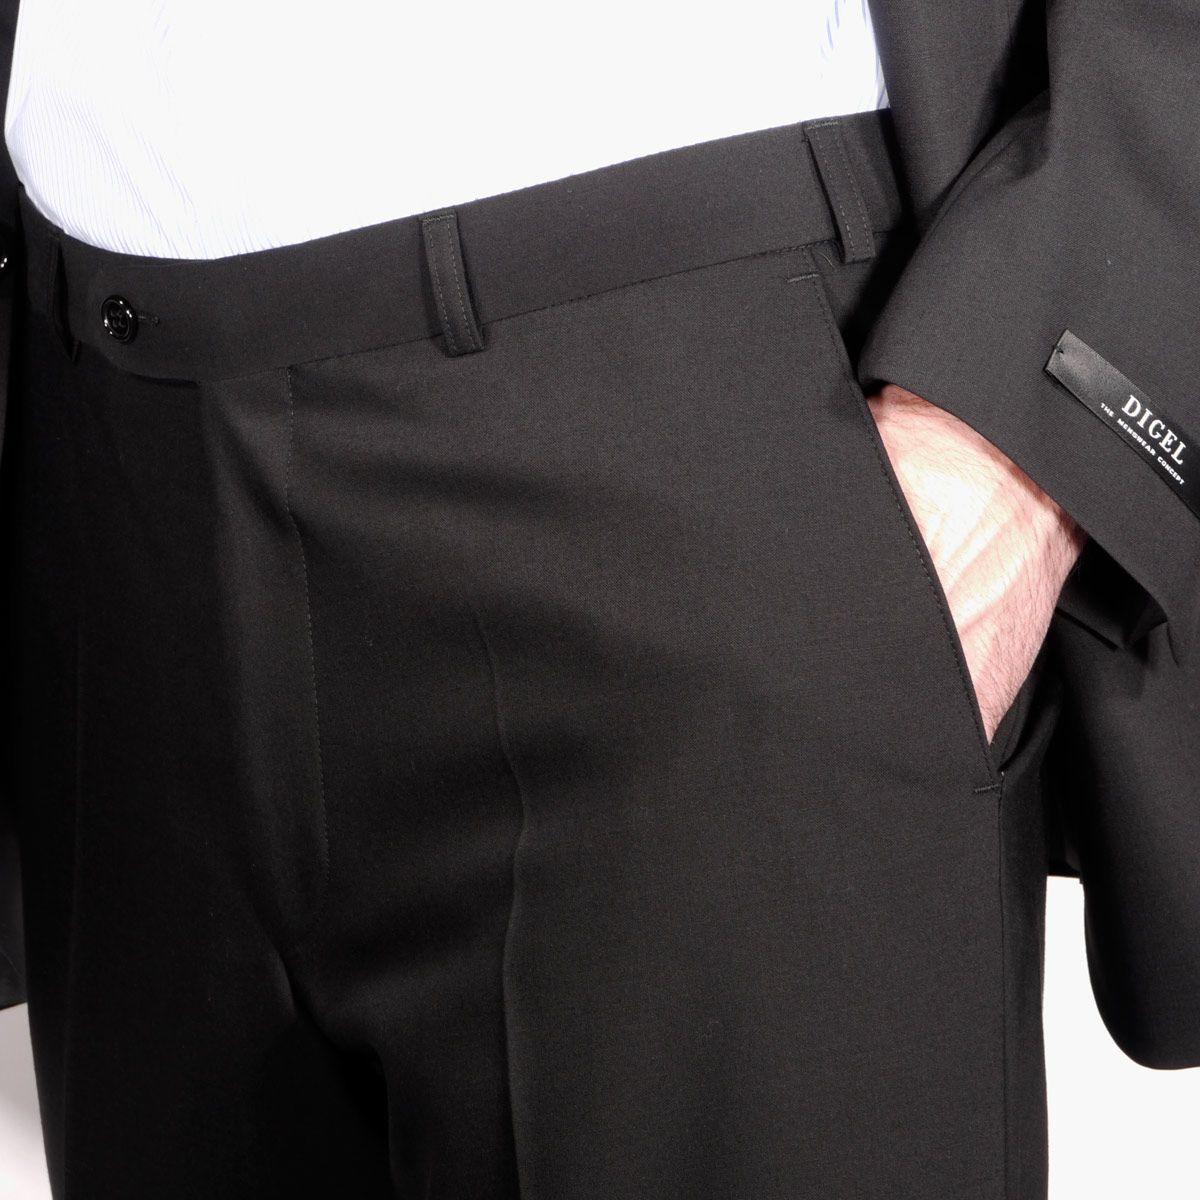 Pantalon noir homme